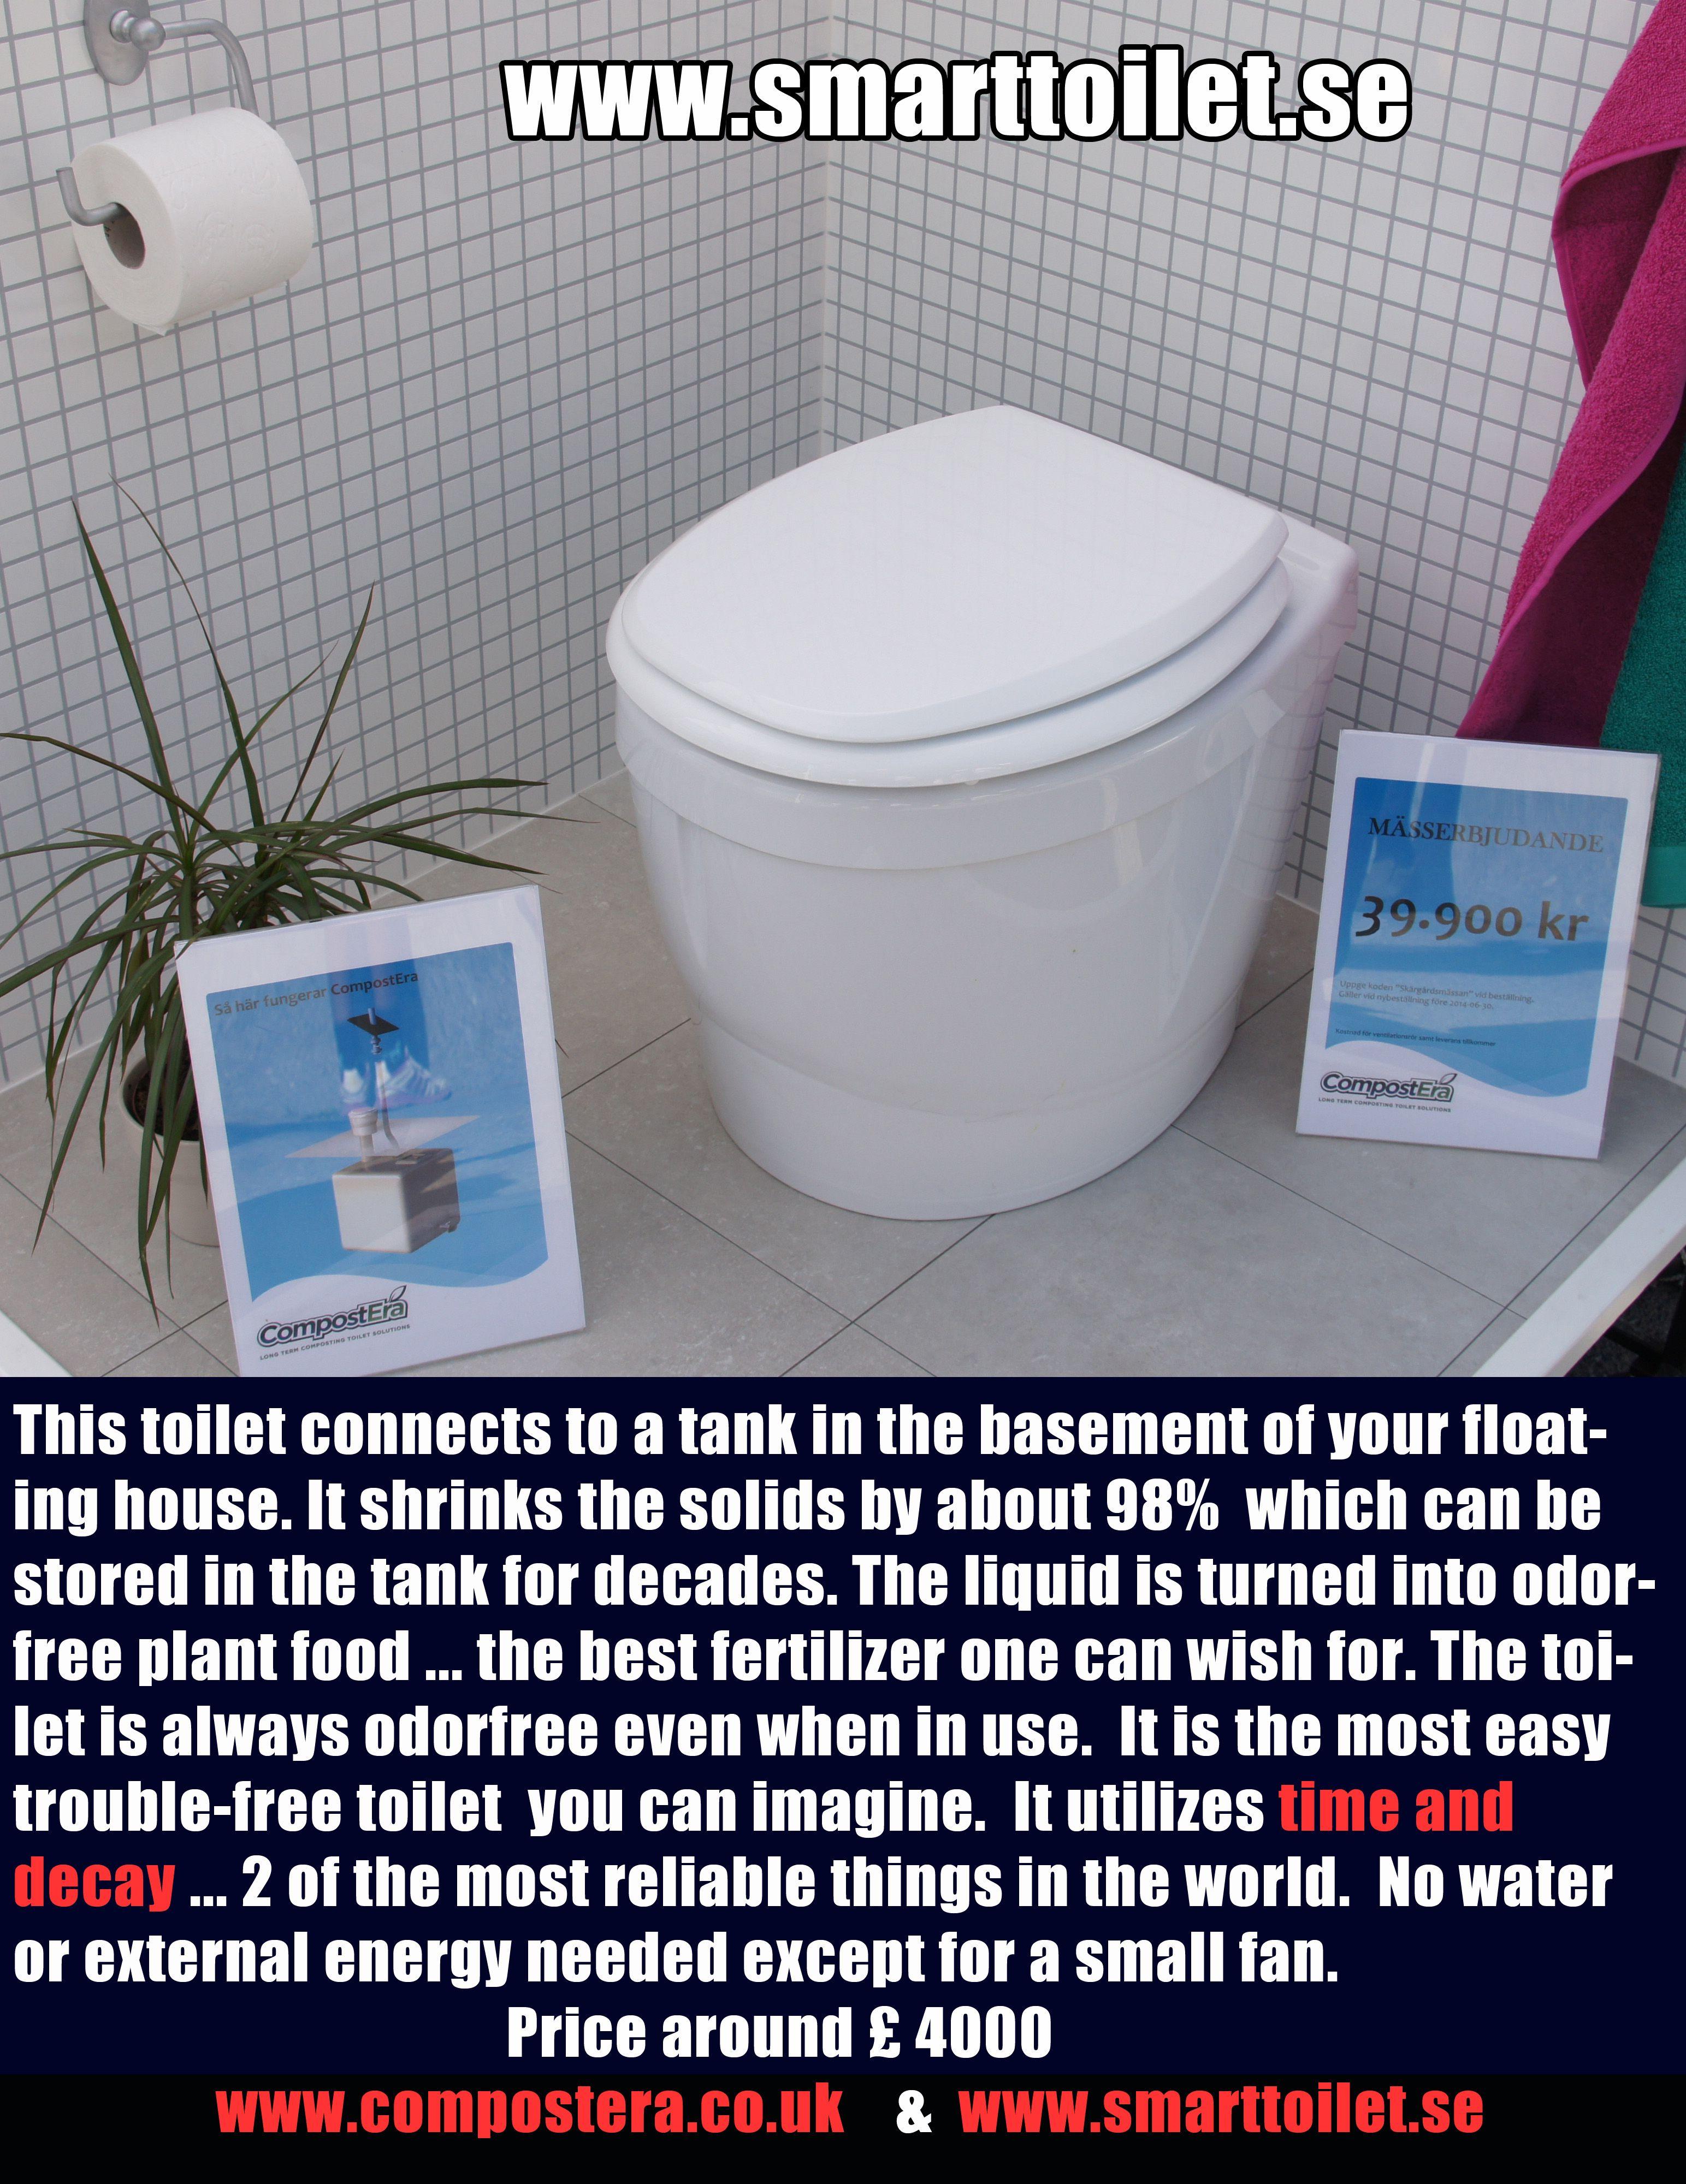 sewerless toilet